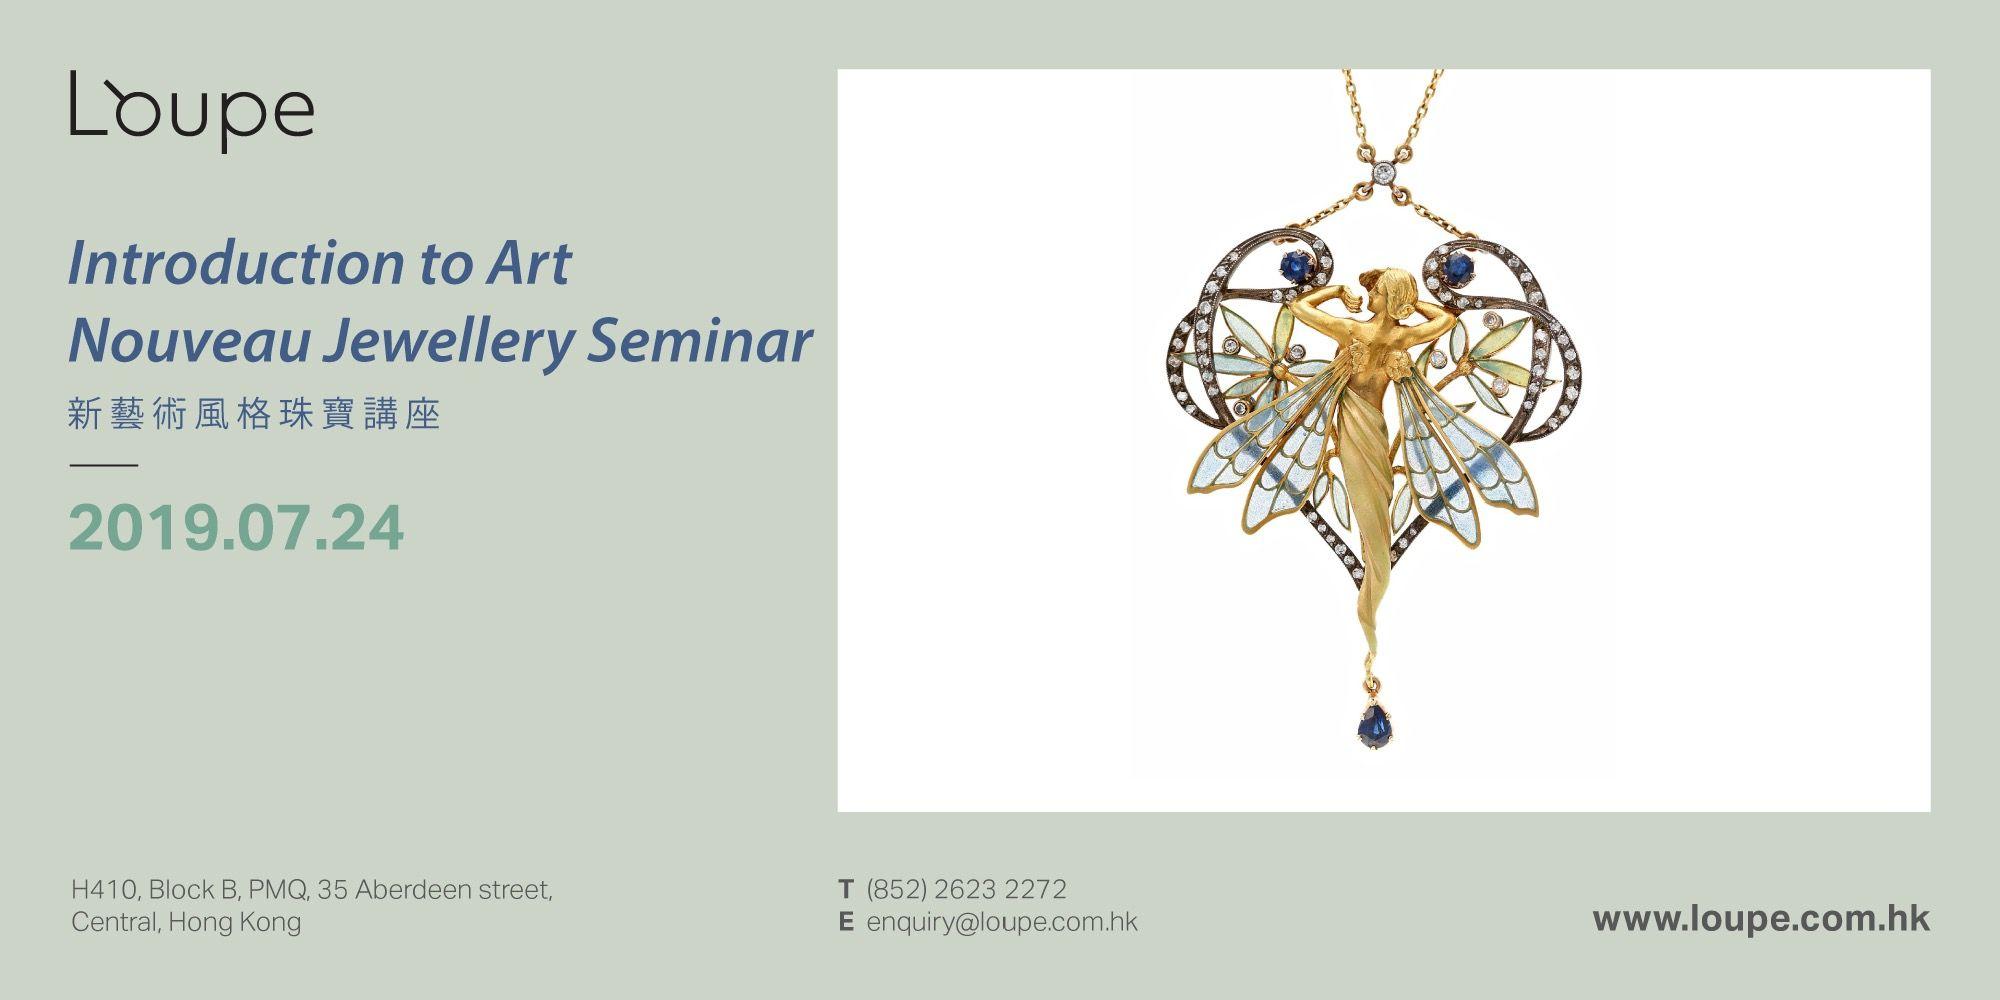 Introduction to Art Nouveau Jewellery Seminar 新藝術風格珠寶講座